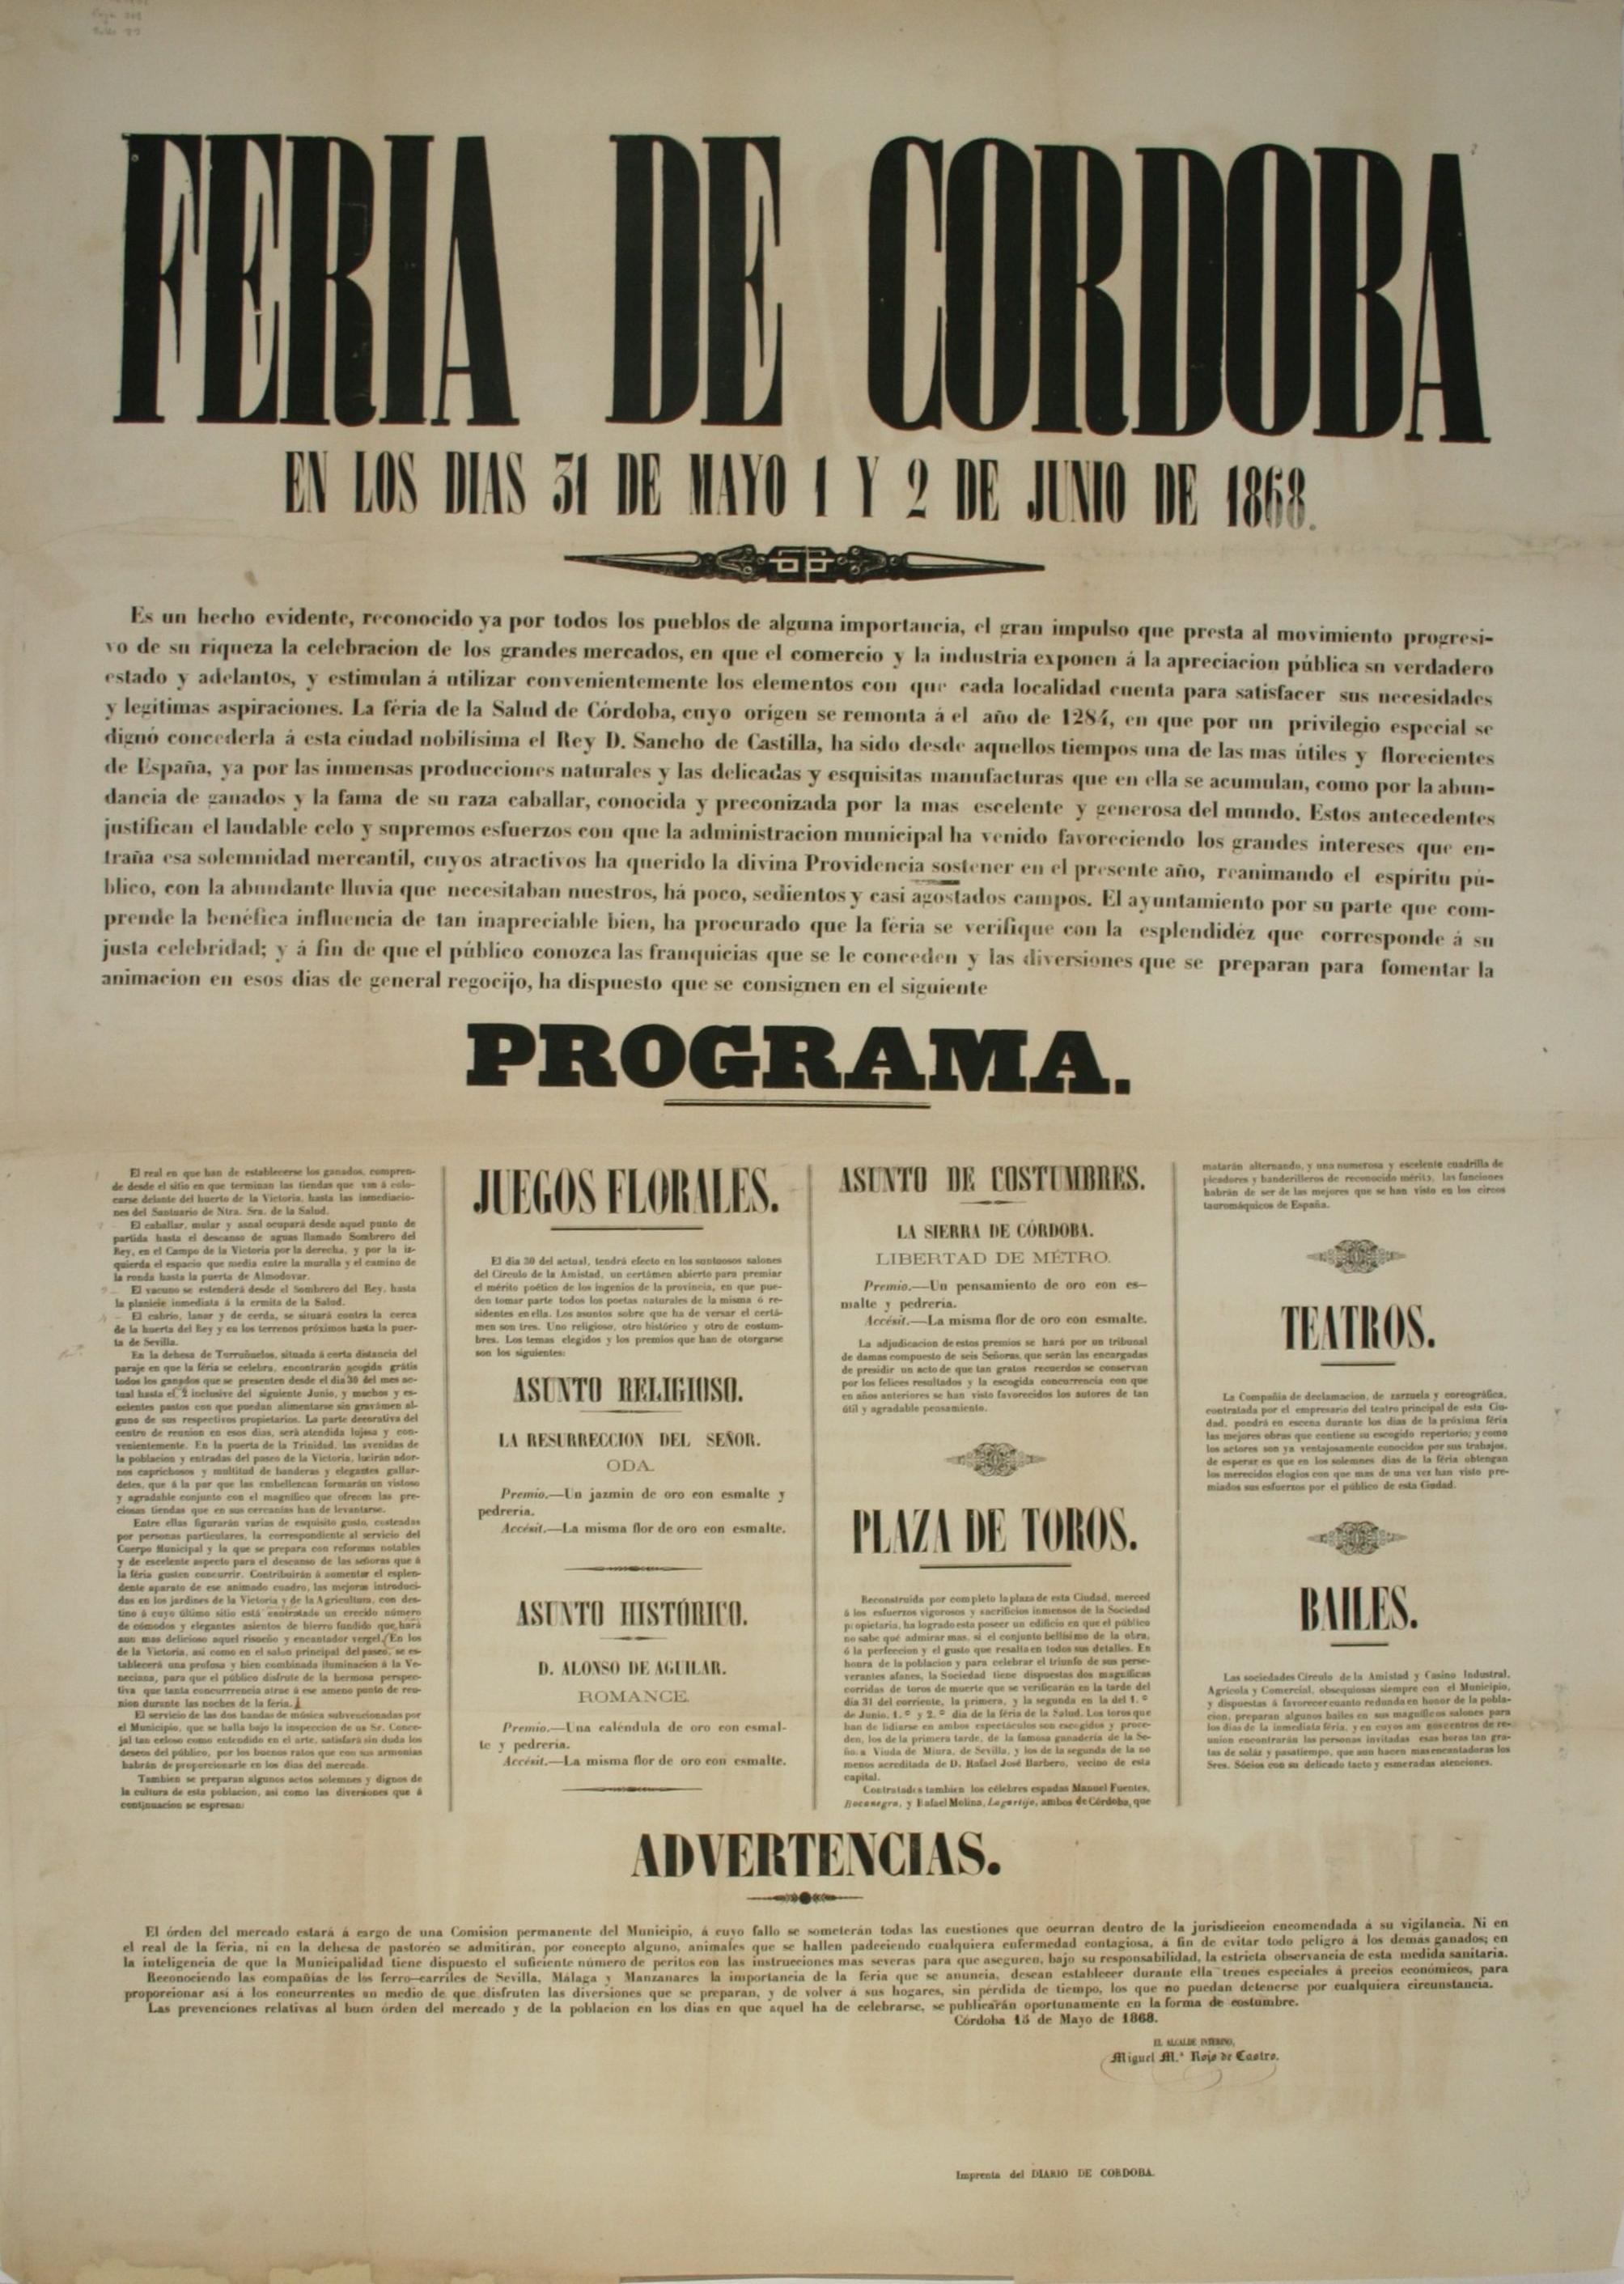 Cartel de la feria de Córdoba 1868